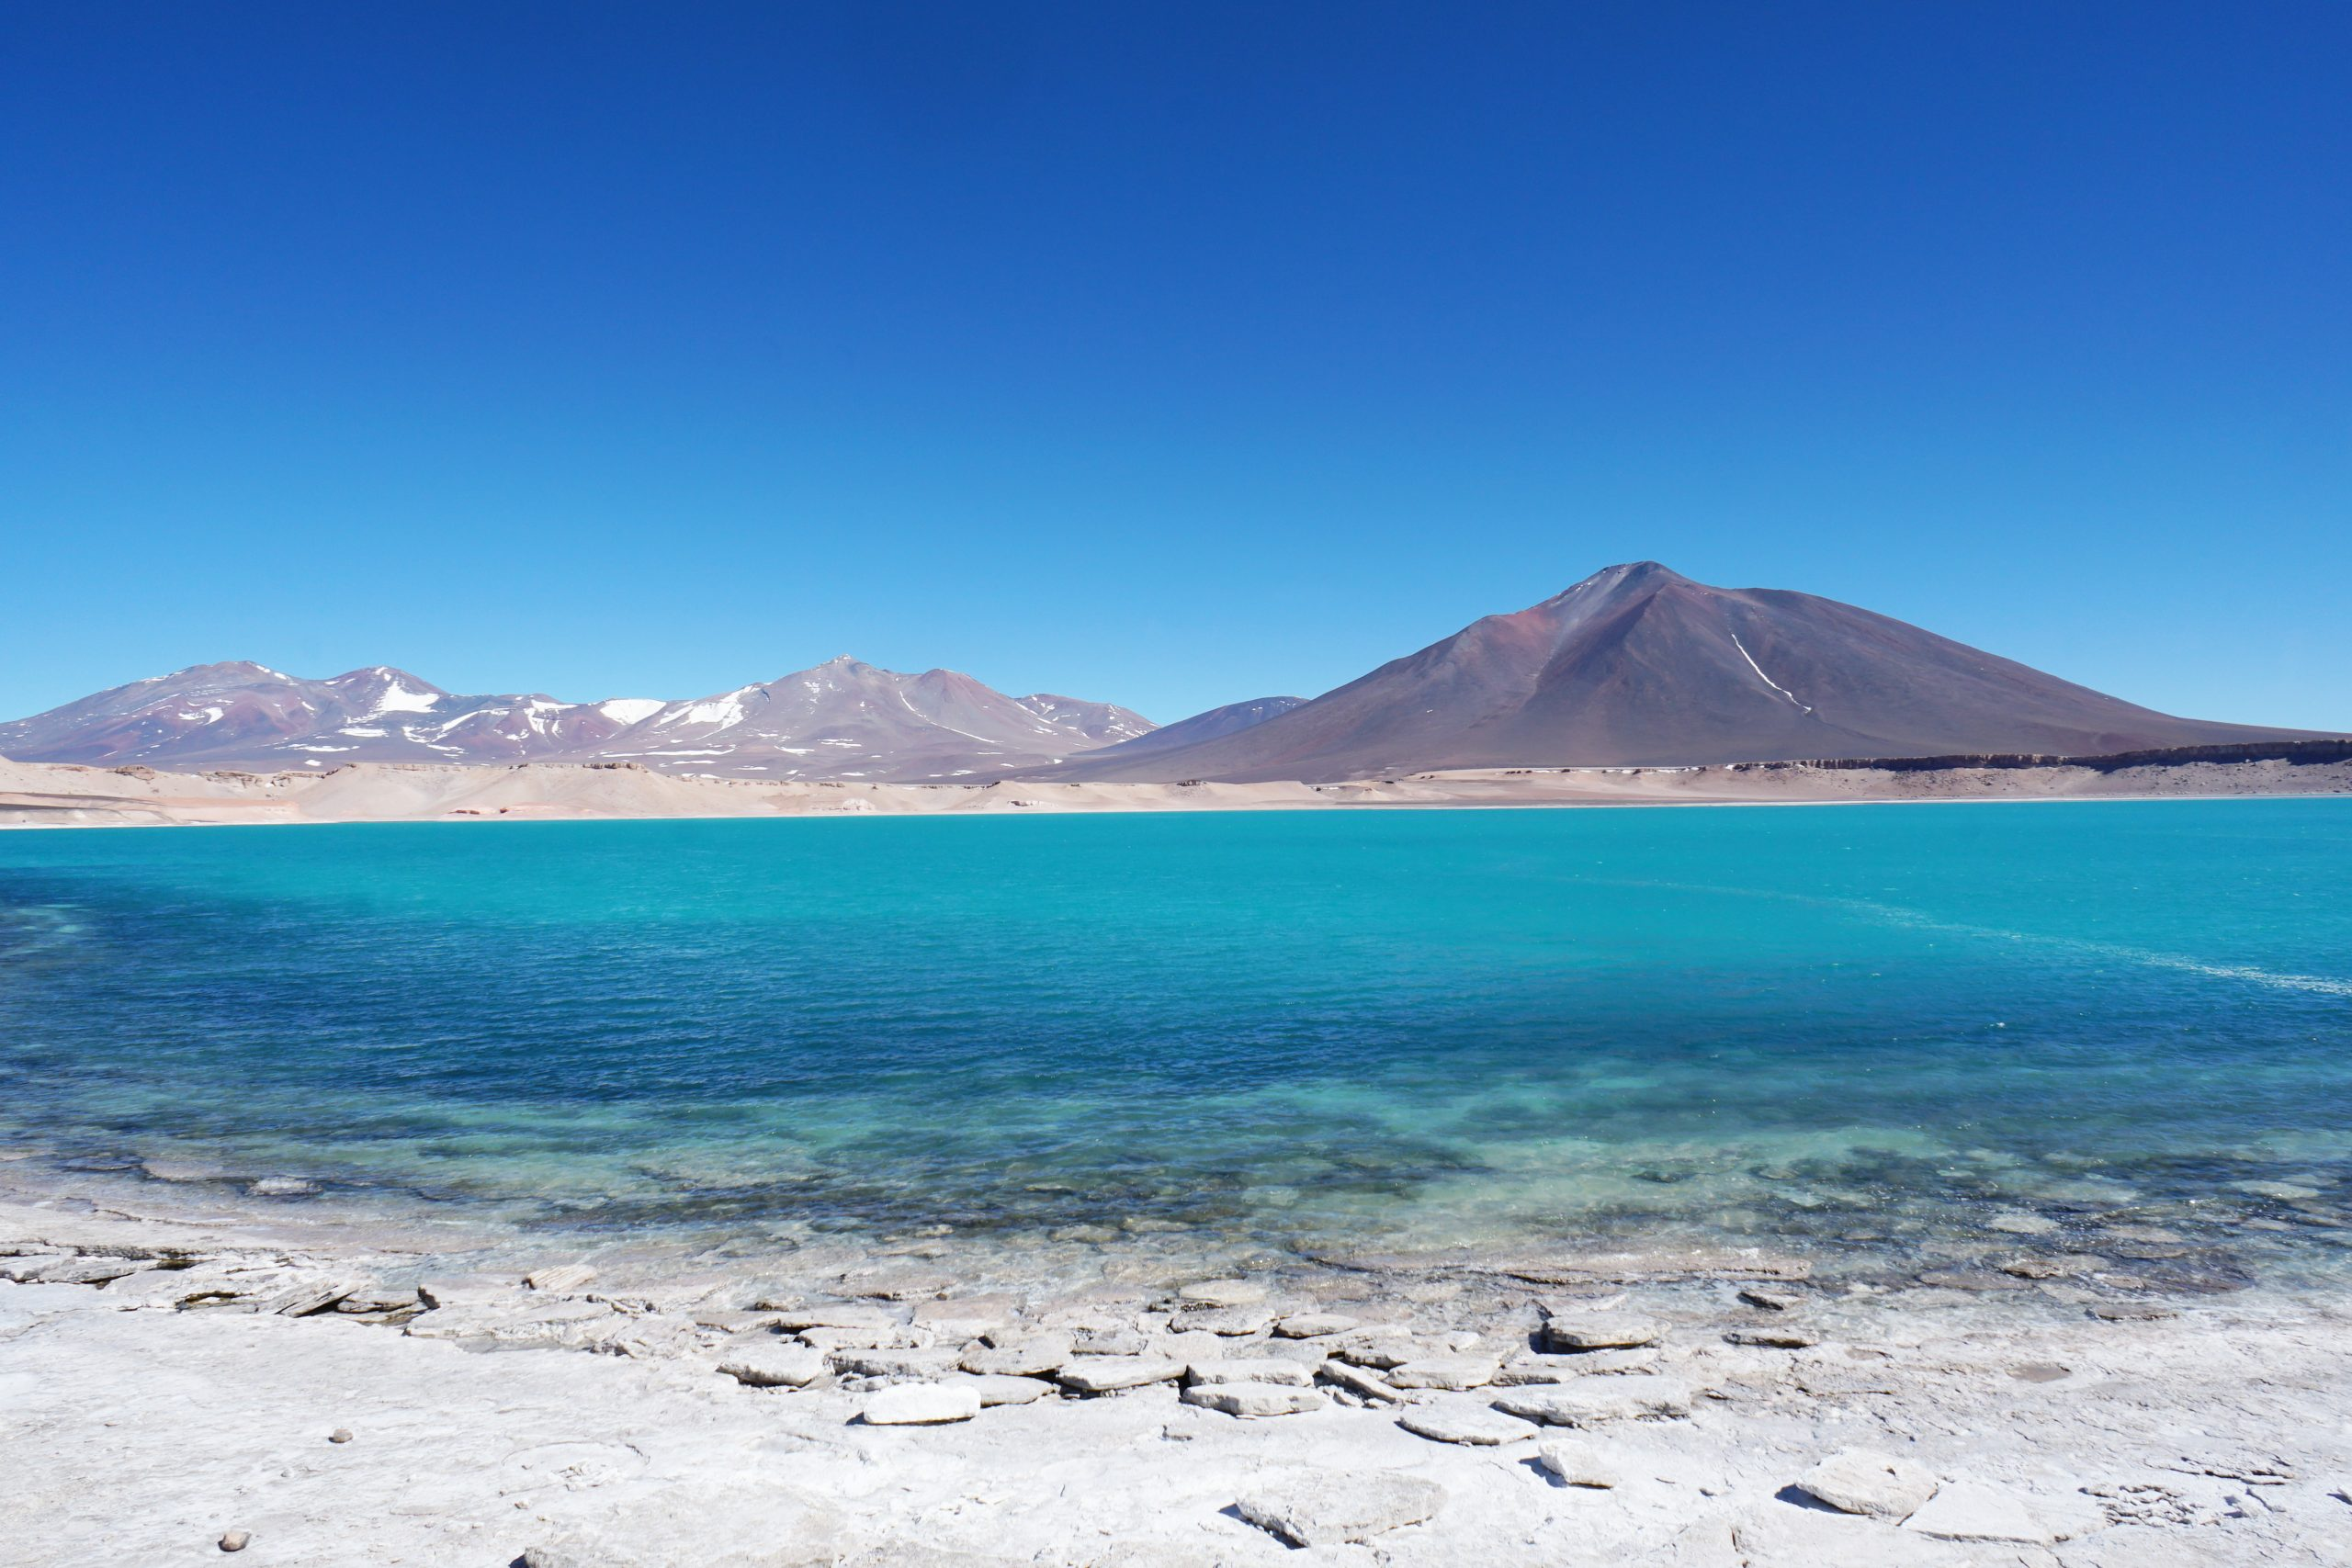 Radreise Südamerika 2019 - Laguna Verde mit Cerro Laguna Verde (5.880m)